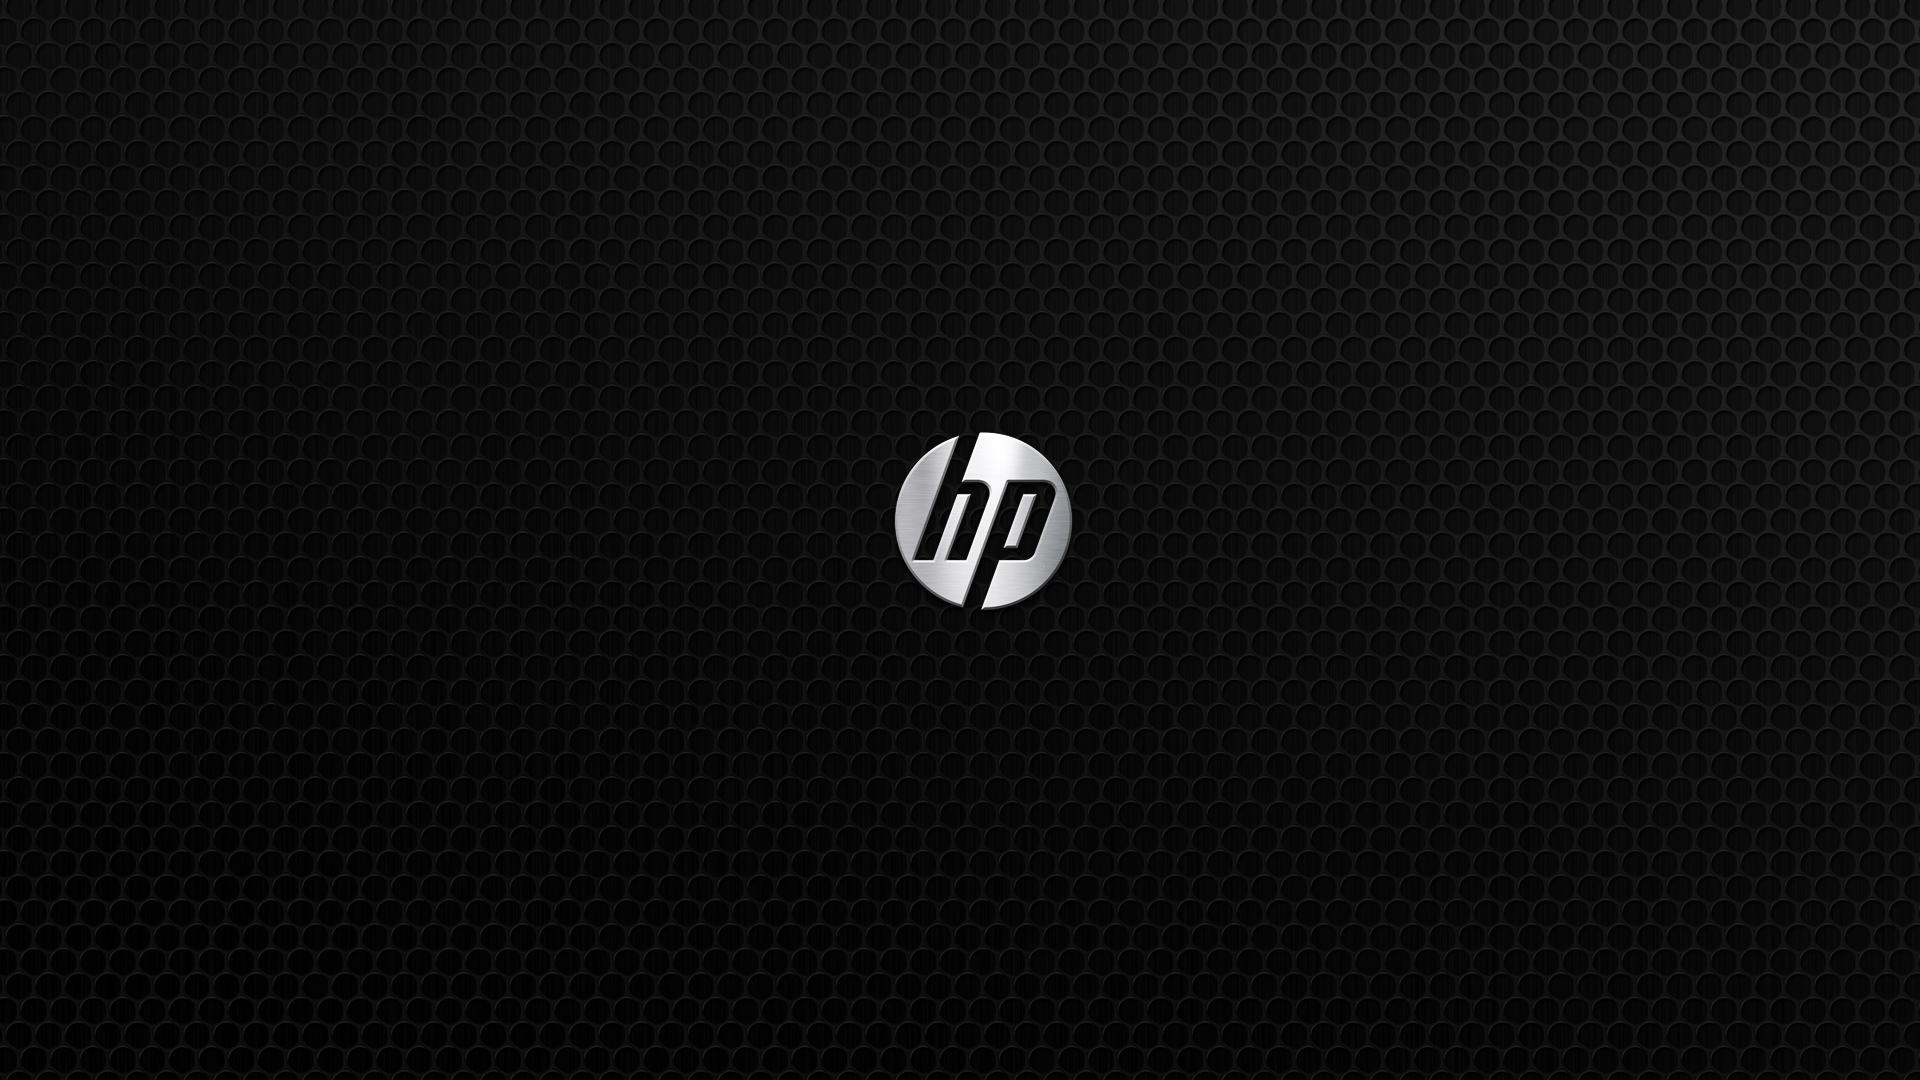 3D HP Logo Wallpaper - WallpaperSafari S Logo 3d Wallpaper